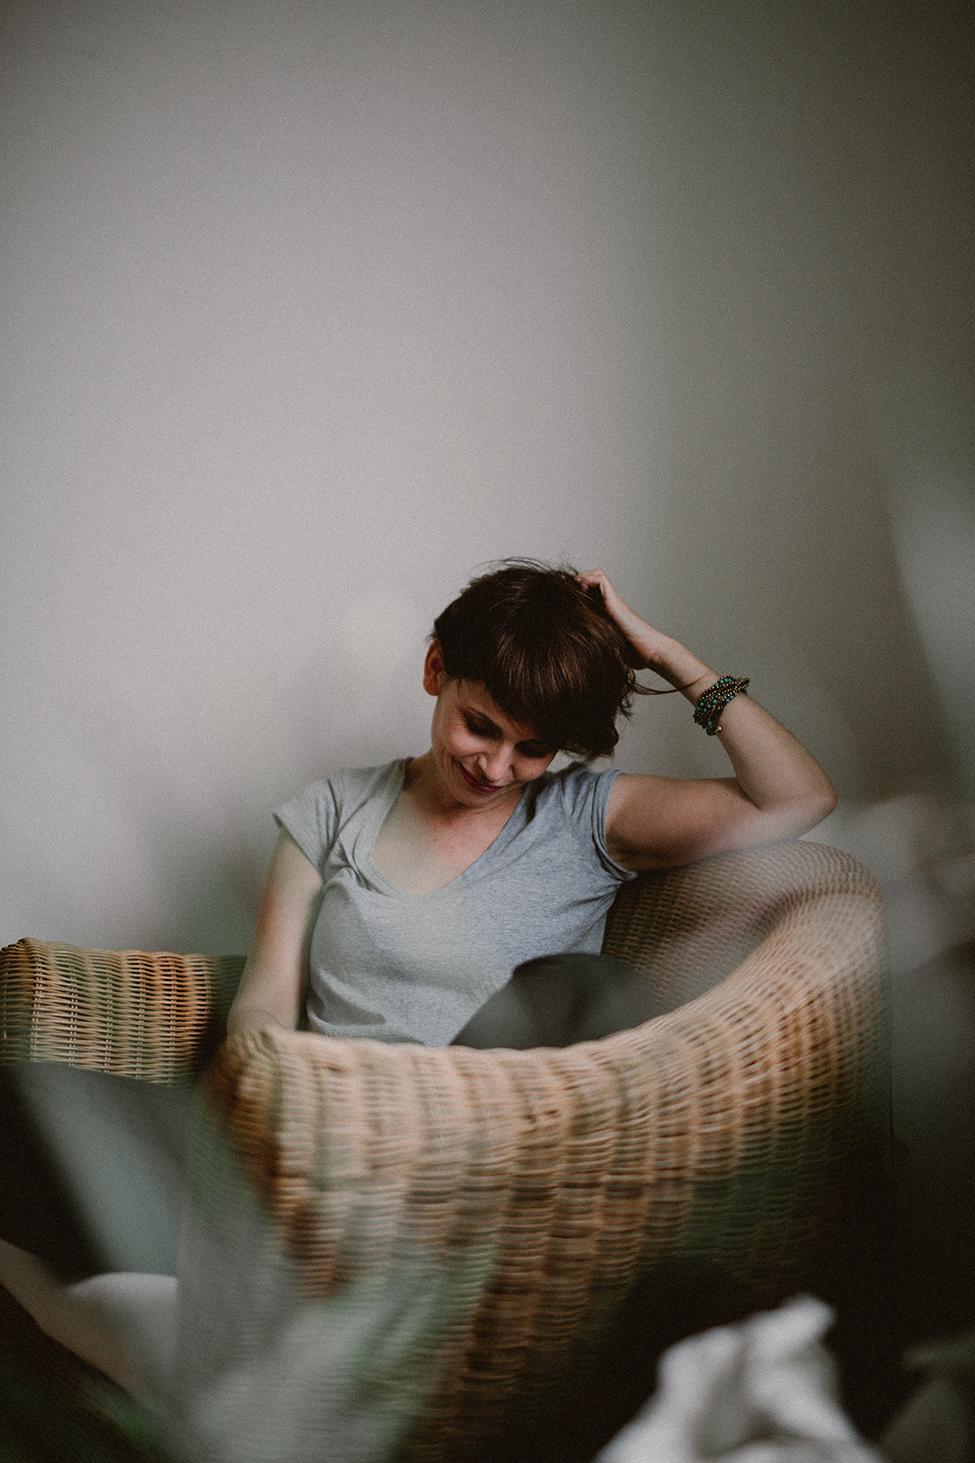 portrait de femme photographe rennes. Black Bedroom Furniture Sets. Home Design Ideas